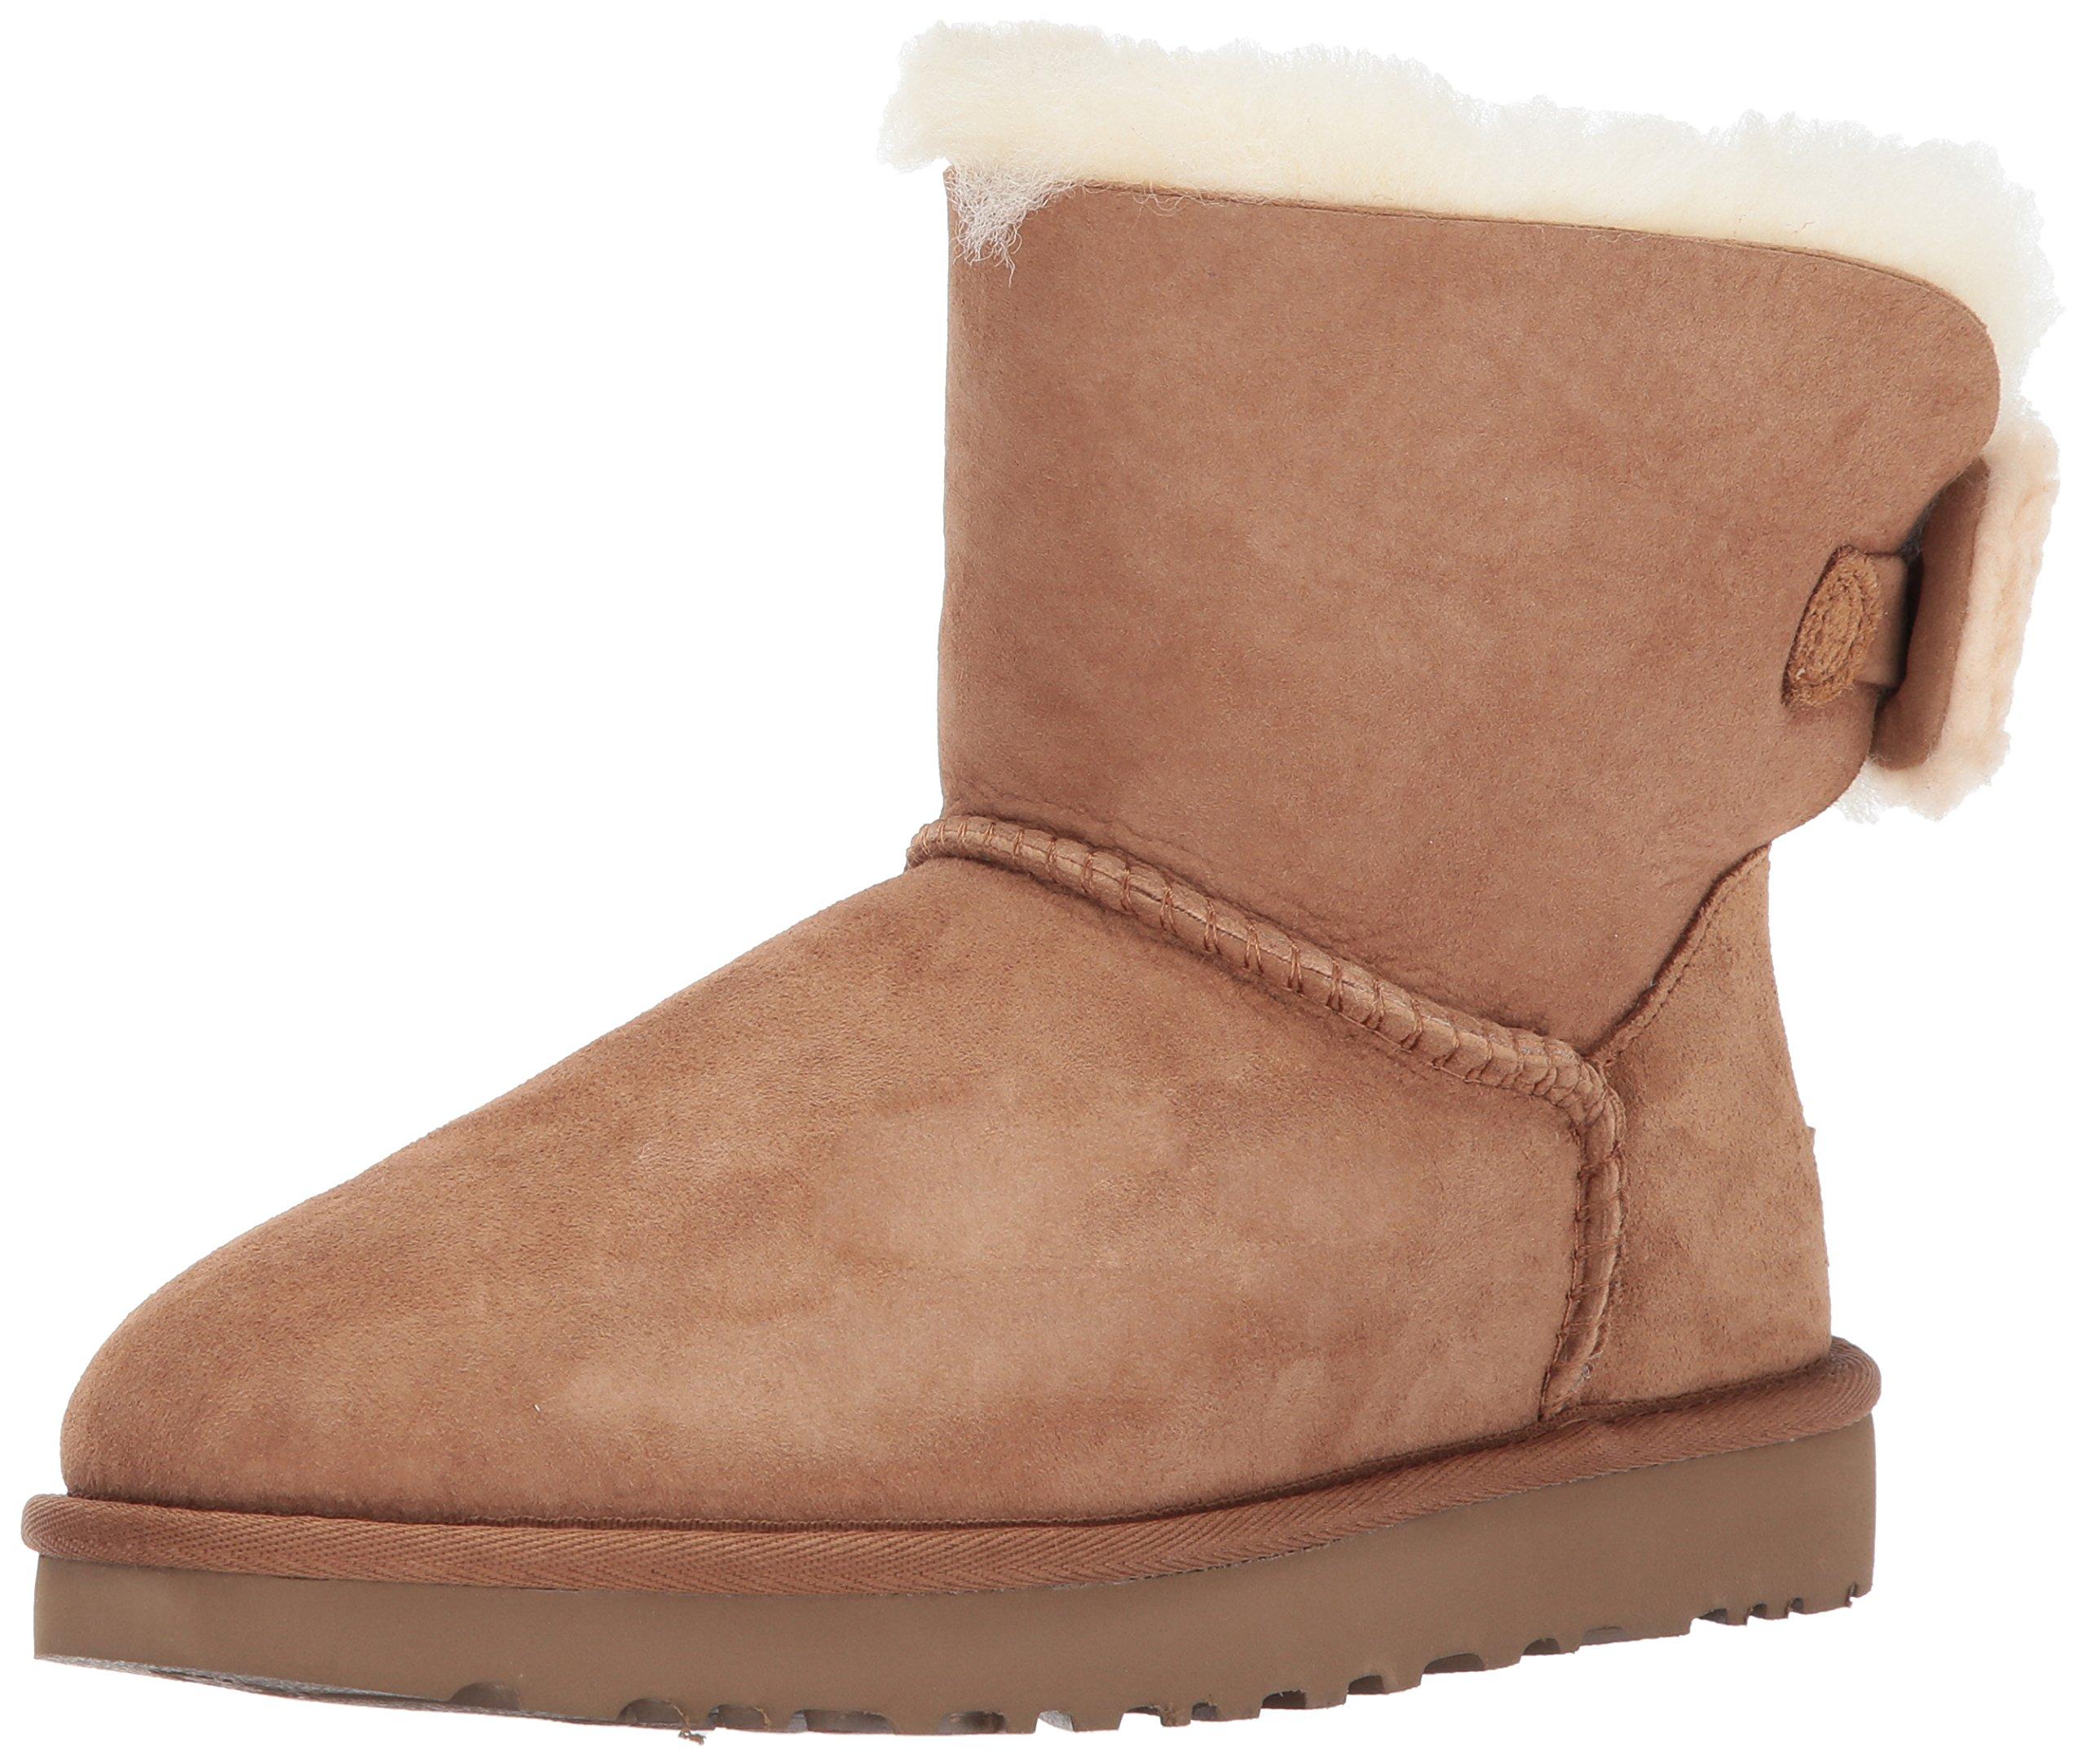 UGG Women's Arielle Winter Boot, Chestnut, 8 M US